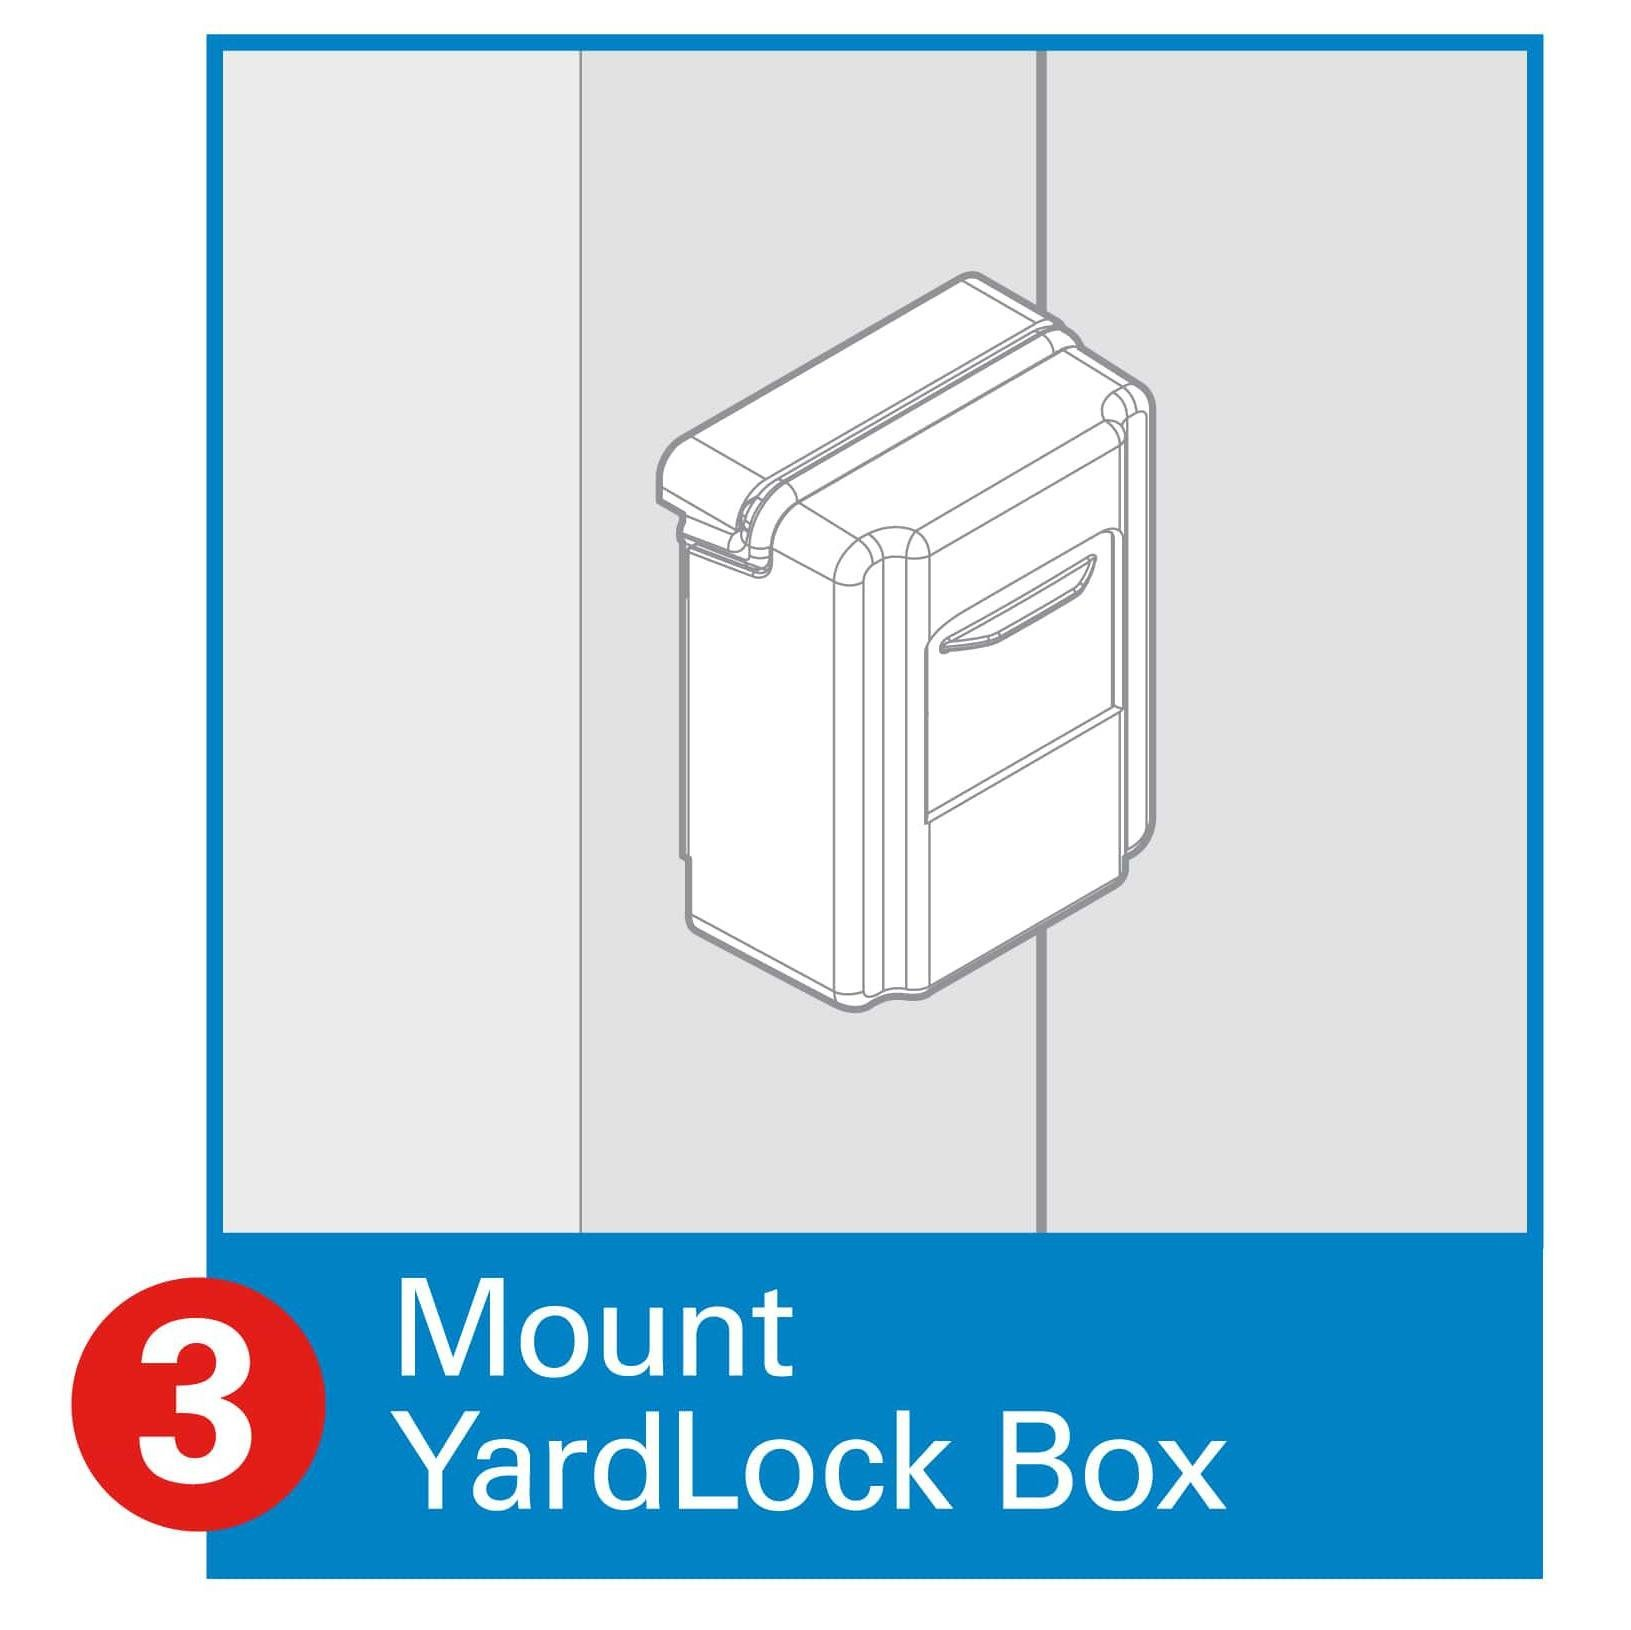 Yardlock Mbx 2016y 3esf In Black Amazon Com